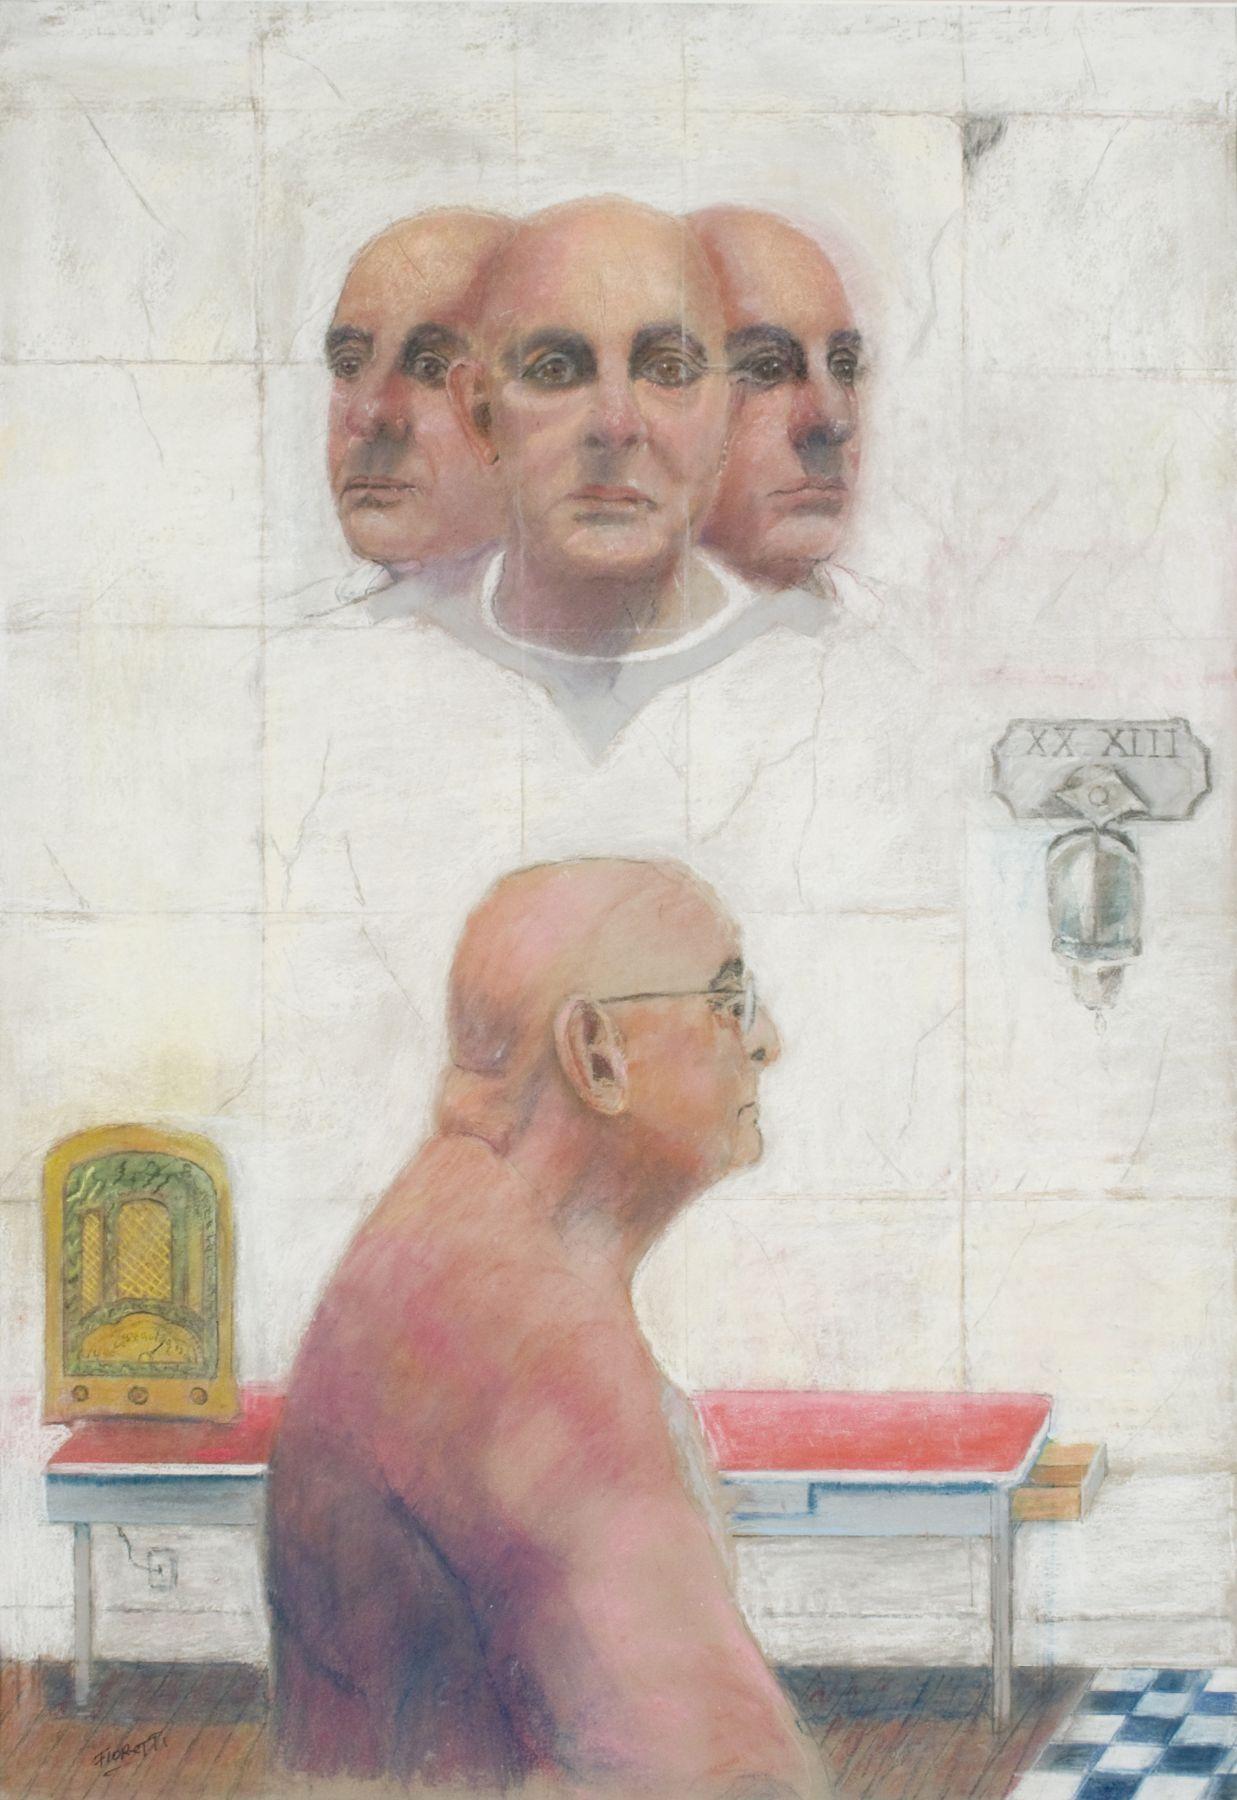 Joseph Fioretti, Four Joeys (SOLD), 2013, pastel on sandpaper, 26 1/2 x 18 1/2 inches